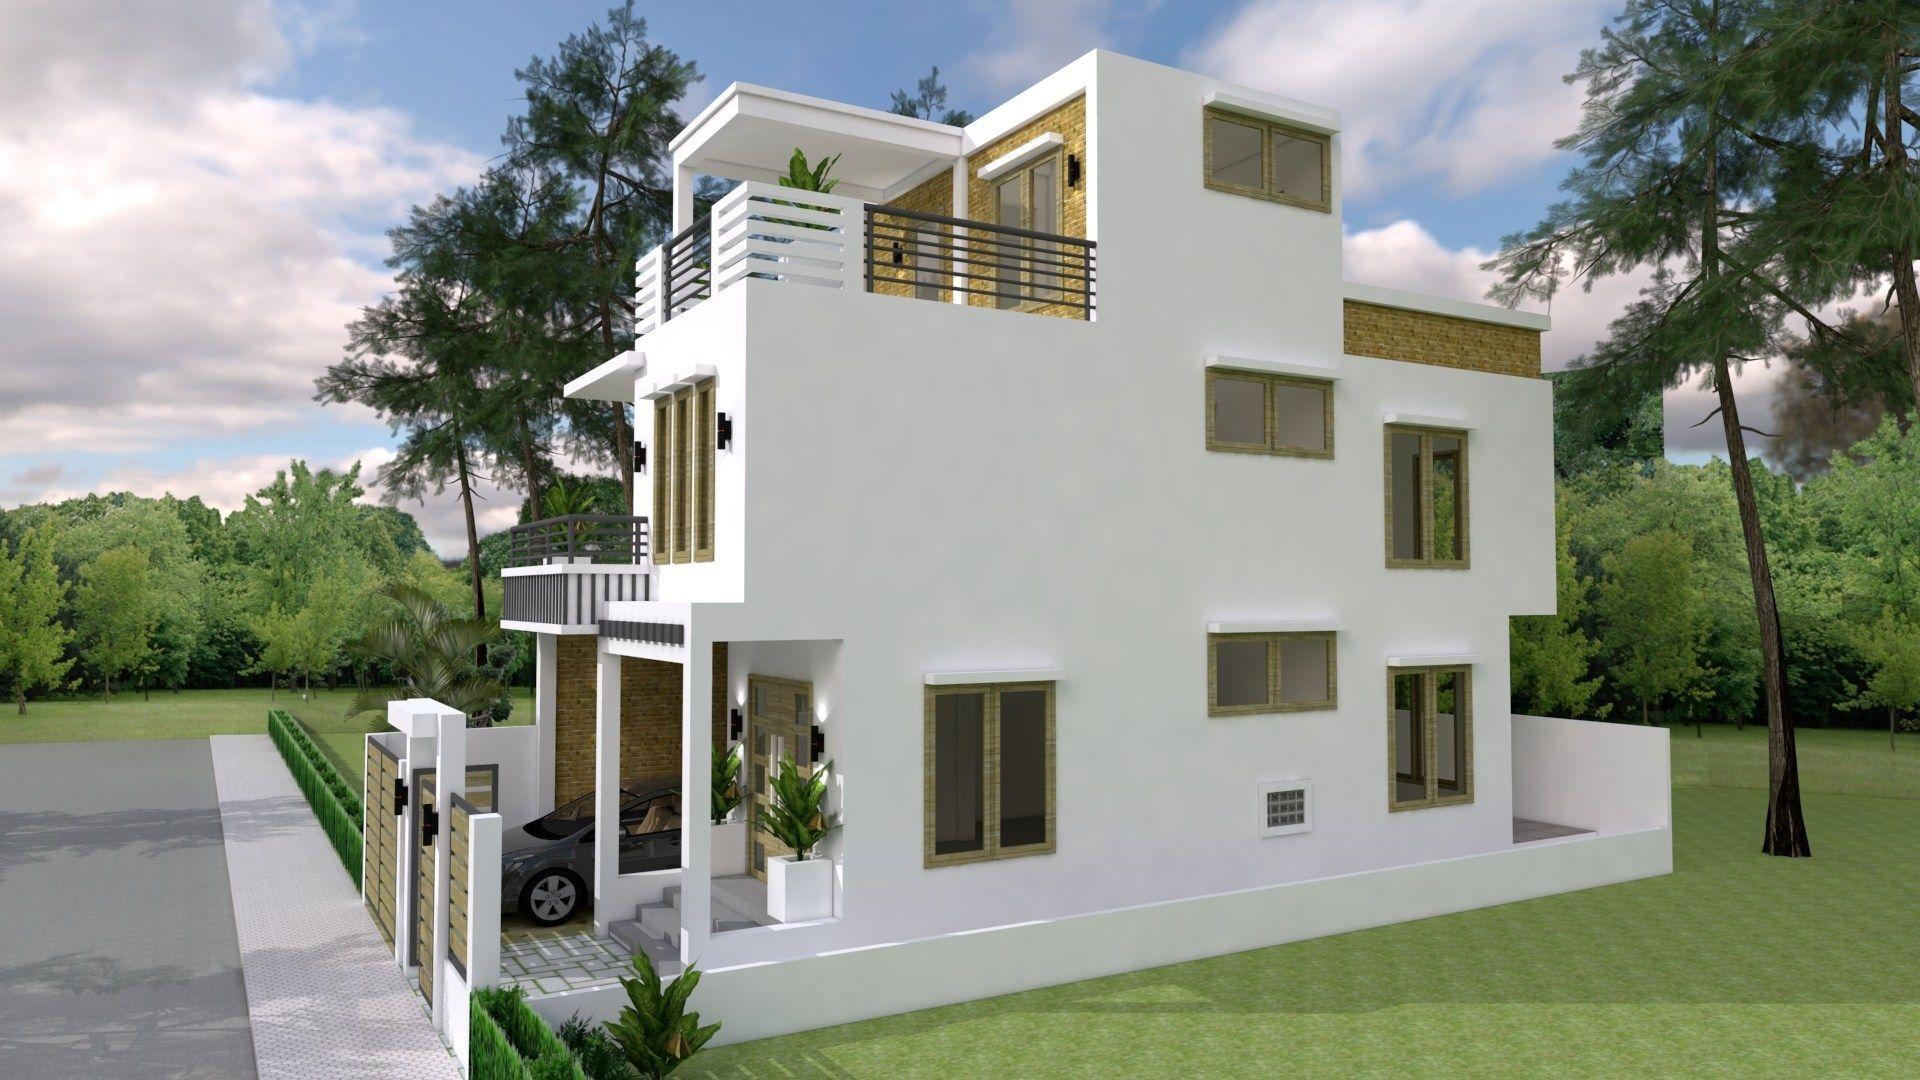 7x15m Simple Home Design Plan With 3 Bedrooms Casas Fachadas